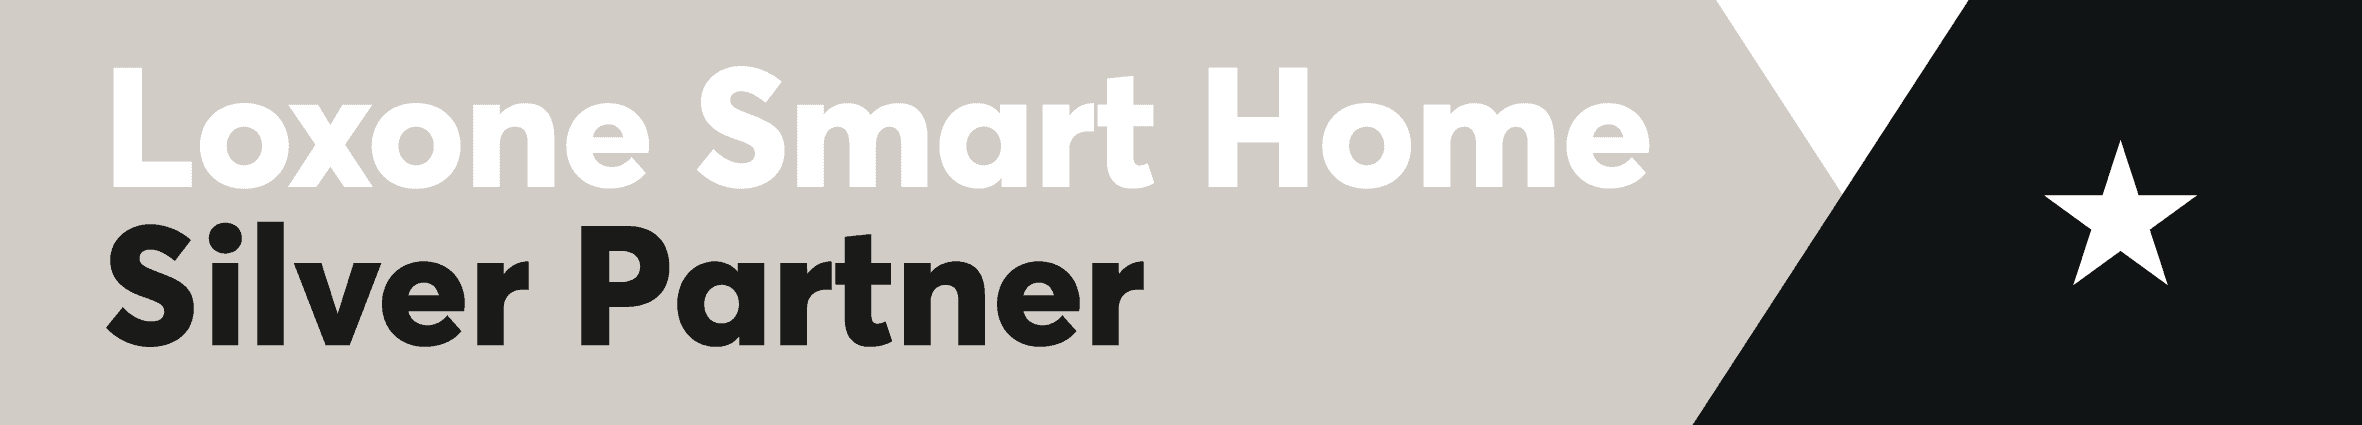 casa inteligente domótica chile - Real Smart